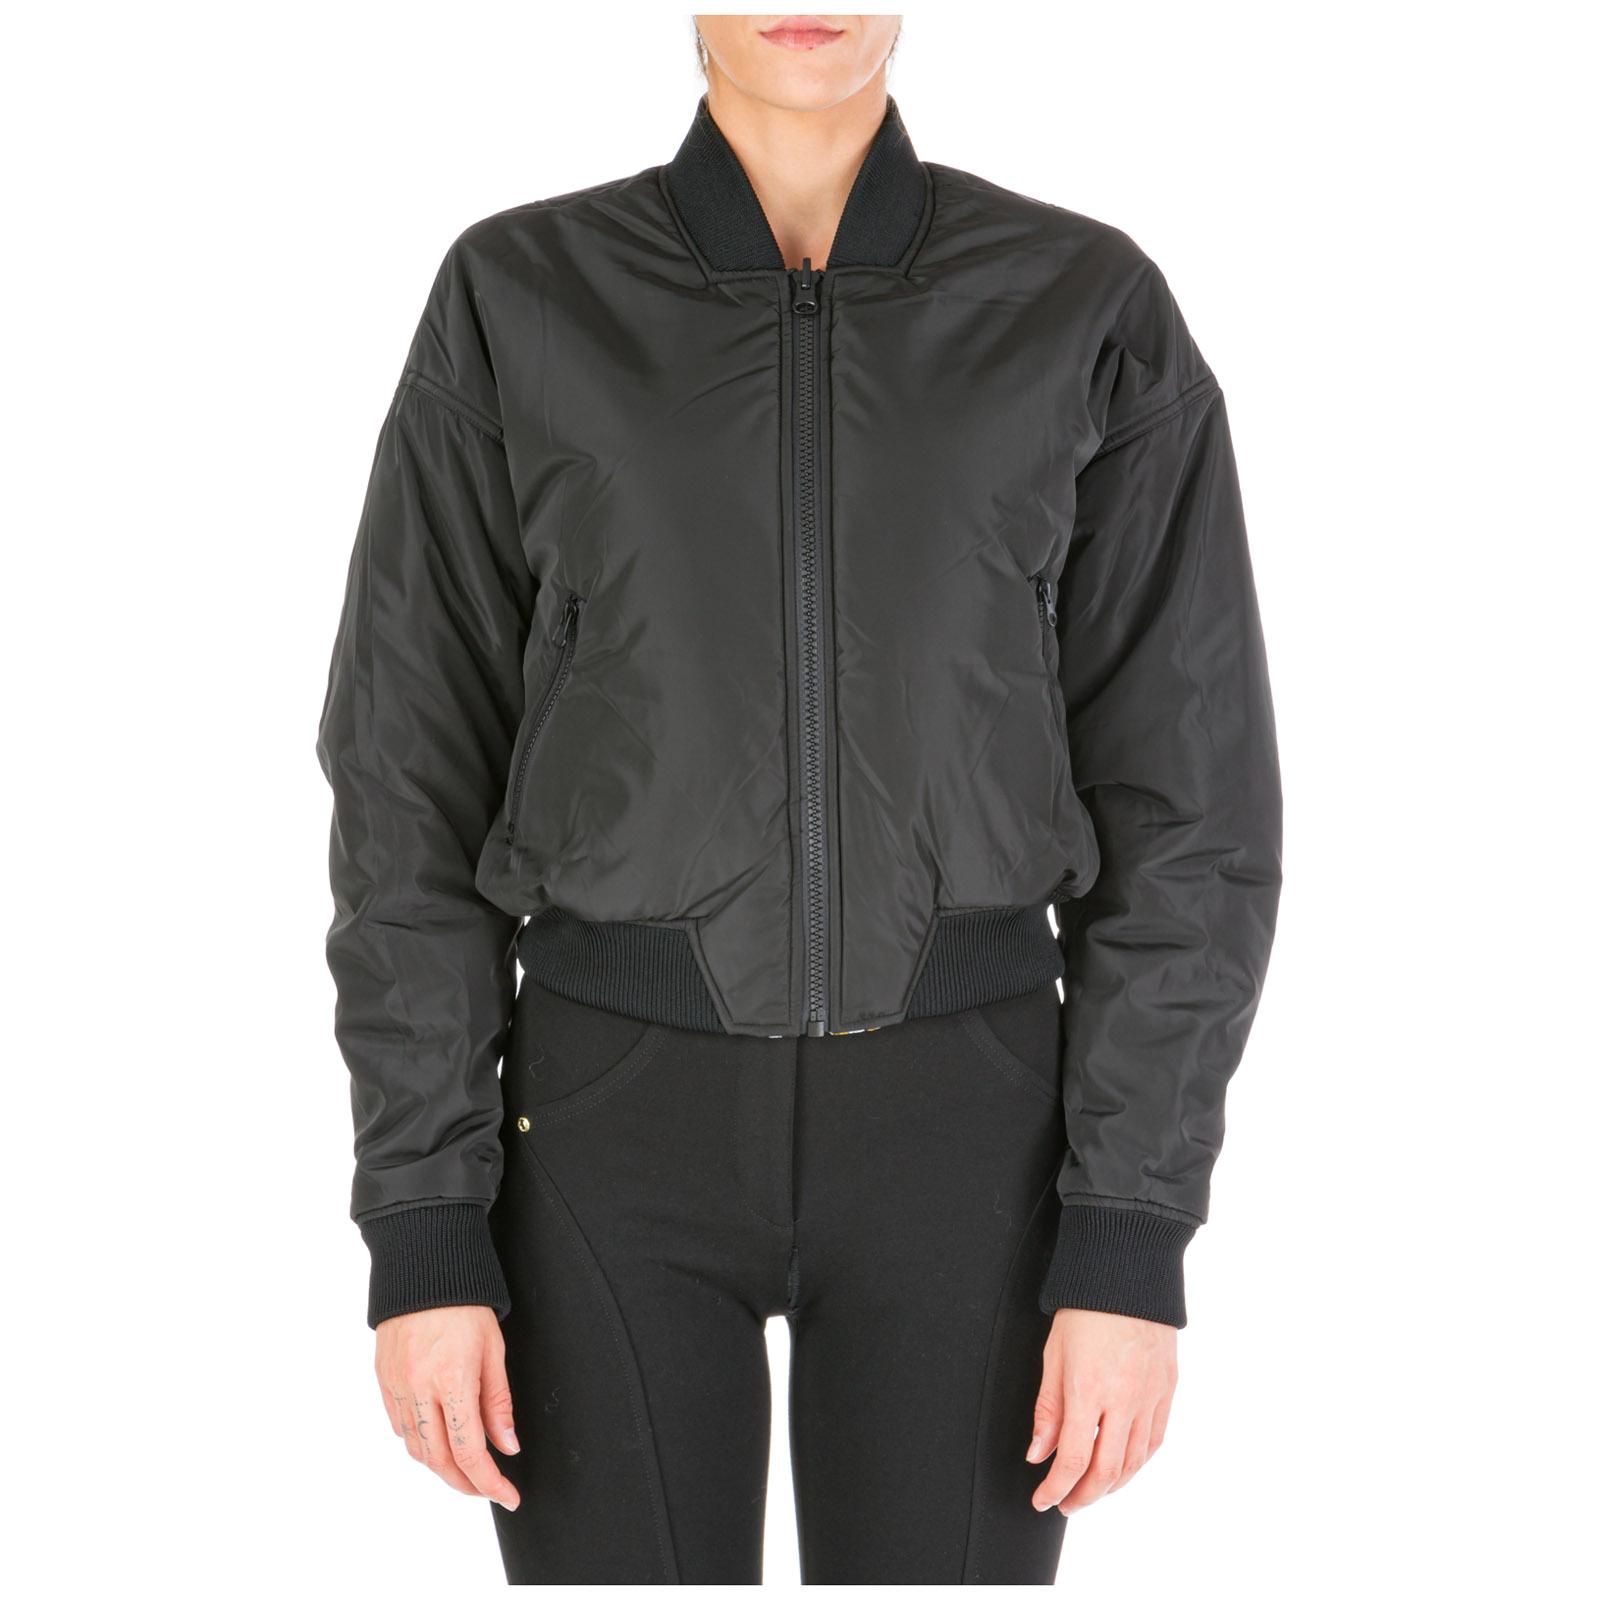 82aed22b Women's outerwear jacket blouson reversibile logo baroque